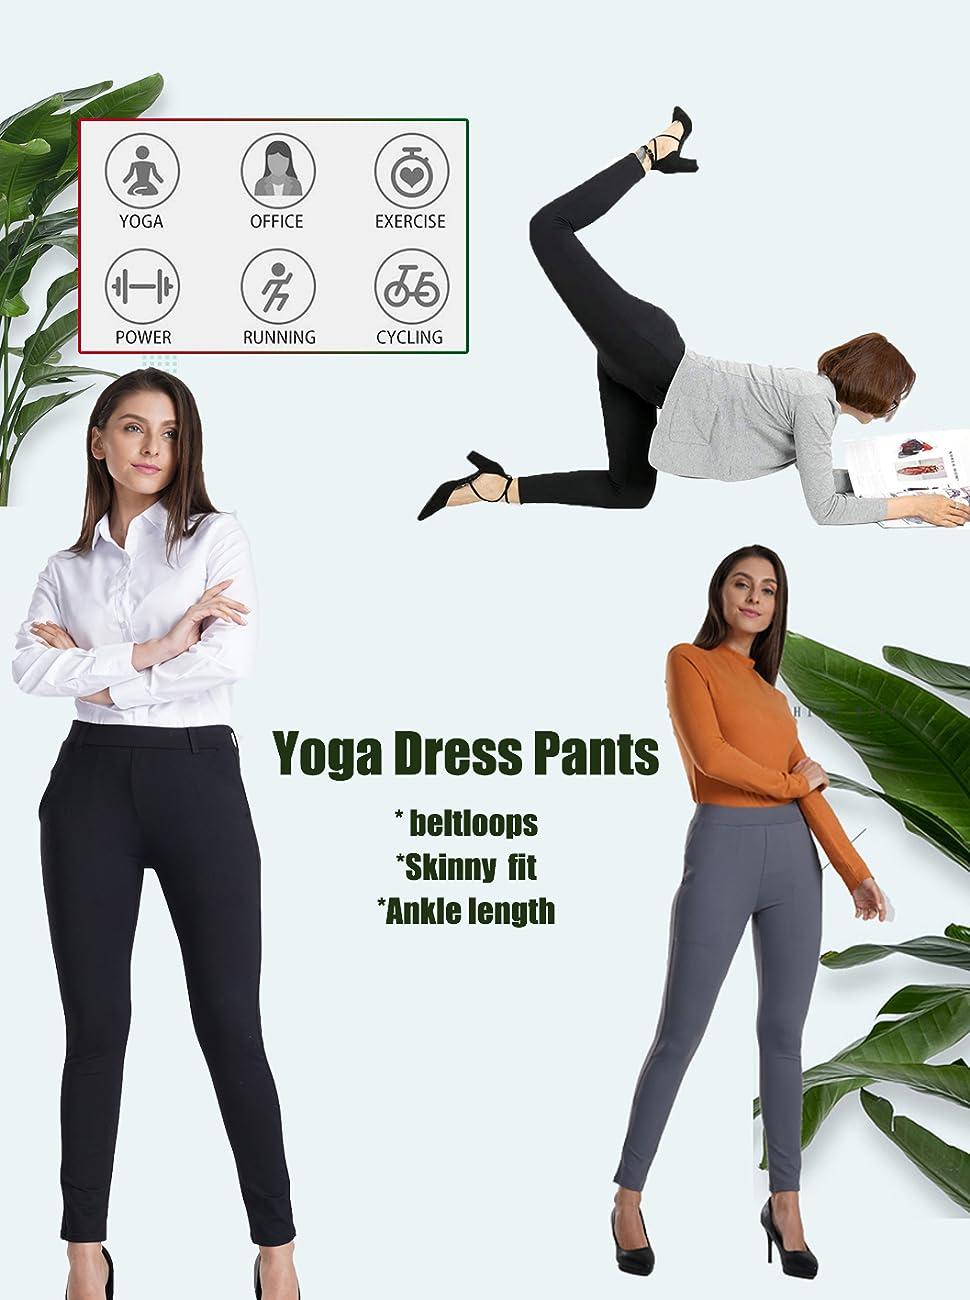 b2a441c9f95c4 Bamans Yoga Dress Pants, Tummy Control Workout Leggings for Women ...